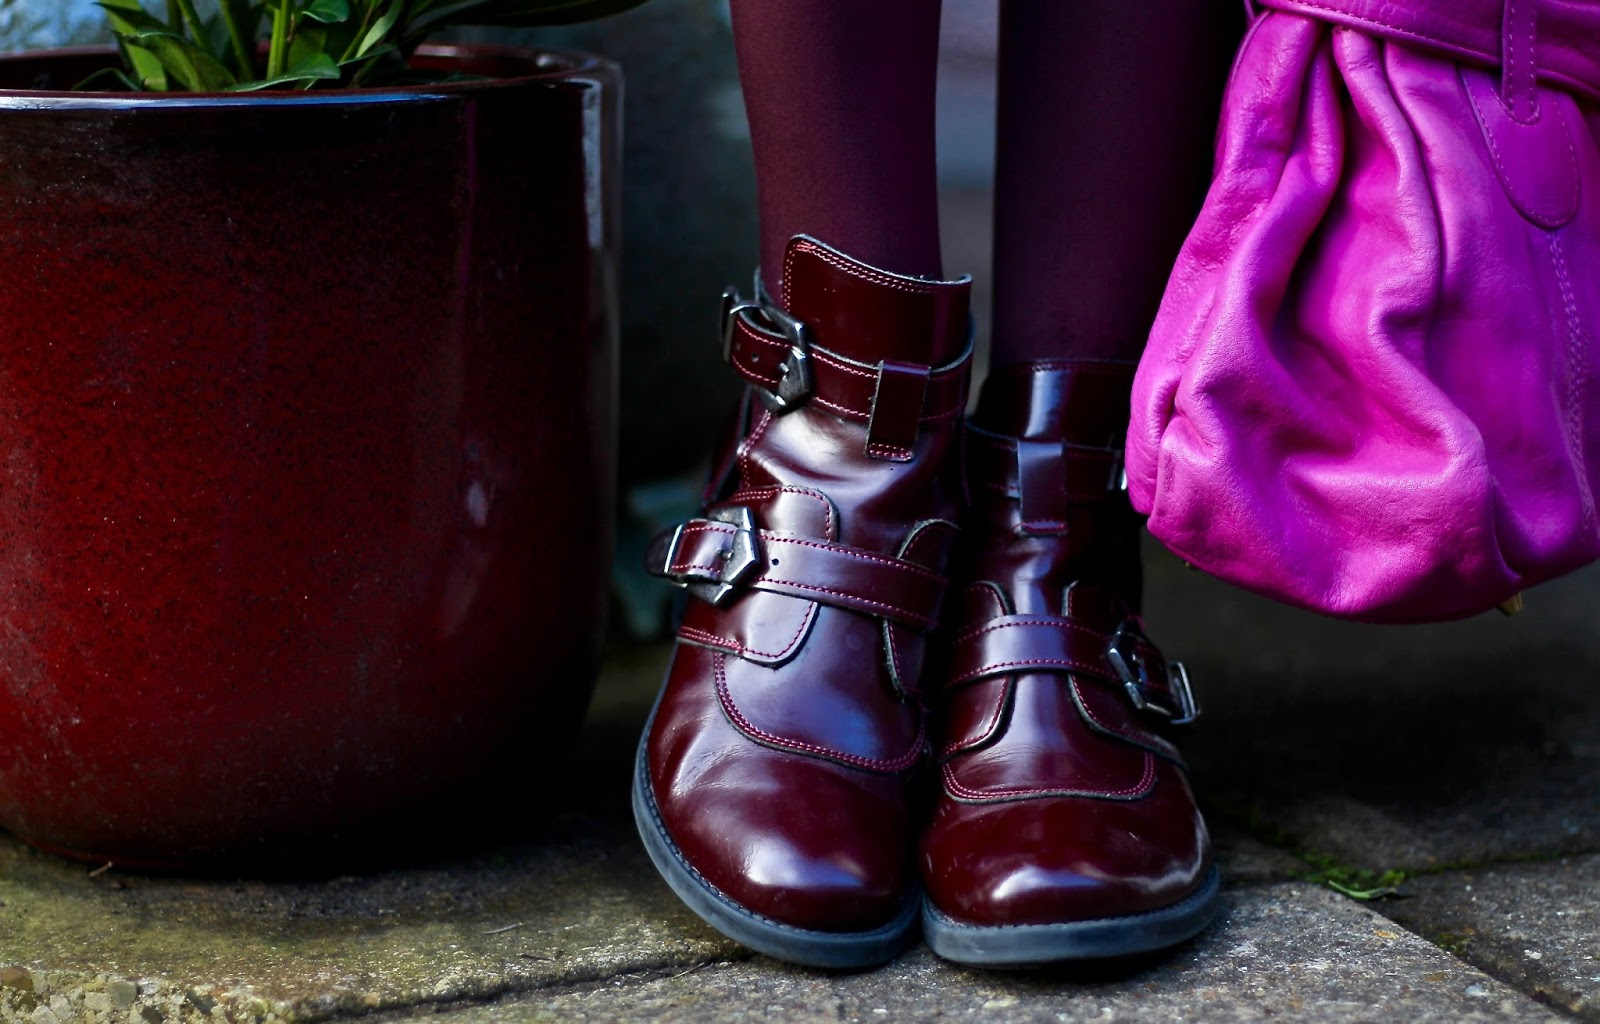 Magenta Wool Dress, Teal Coat, Fuschia Bag | Winter Colour | Fake Fabulous